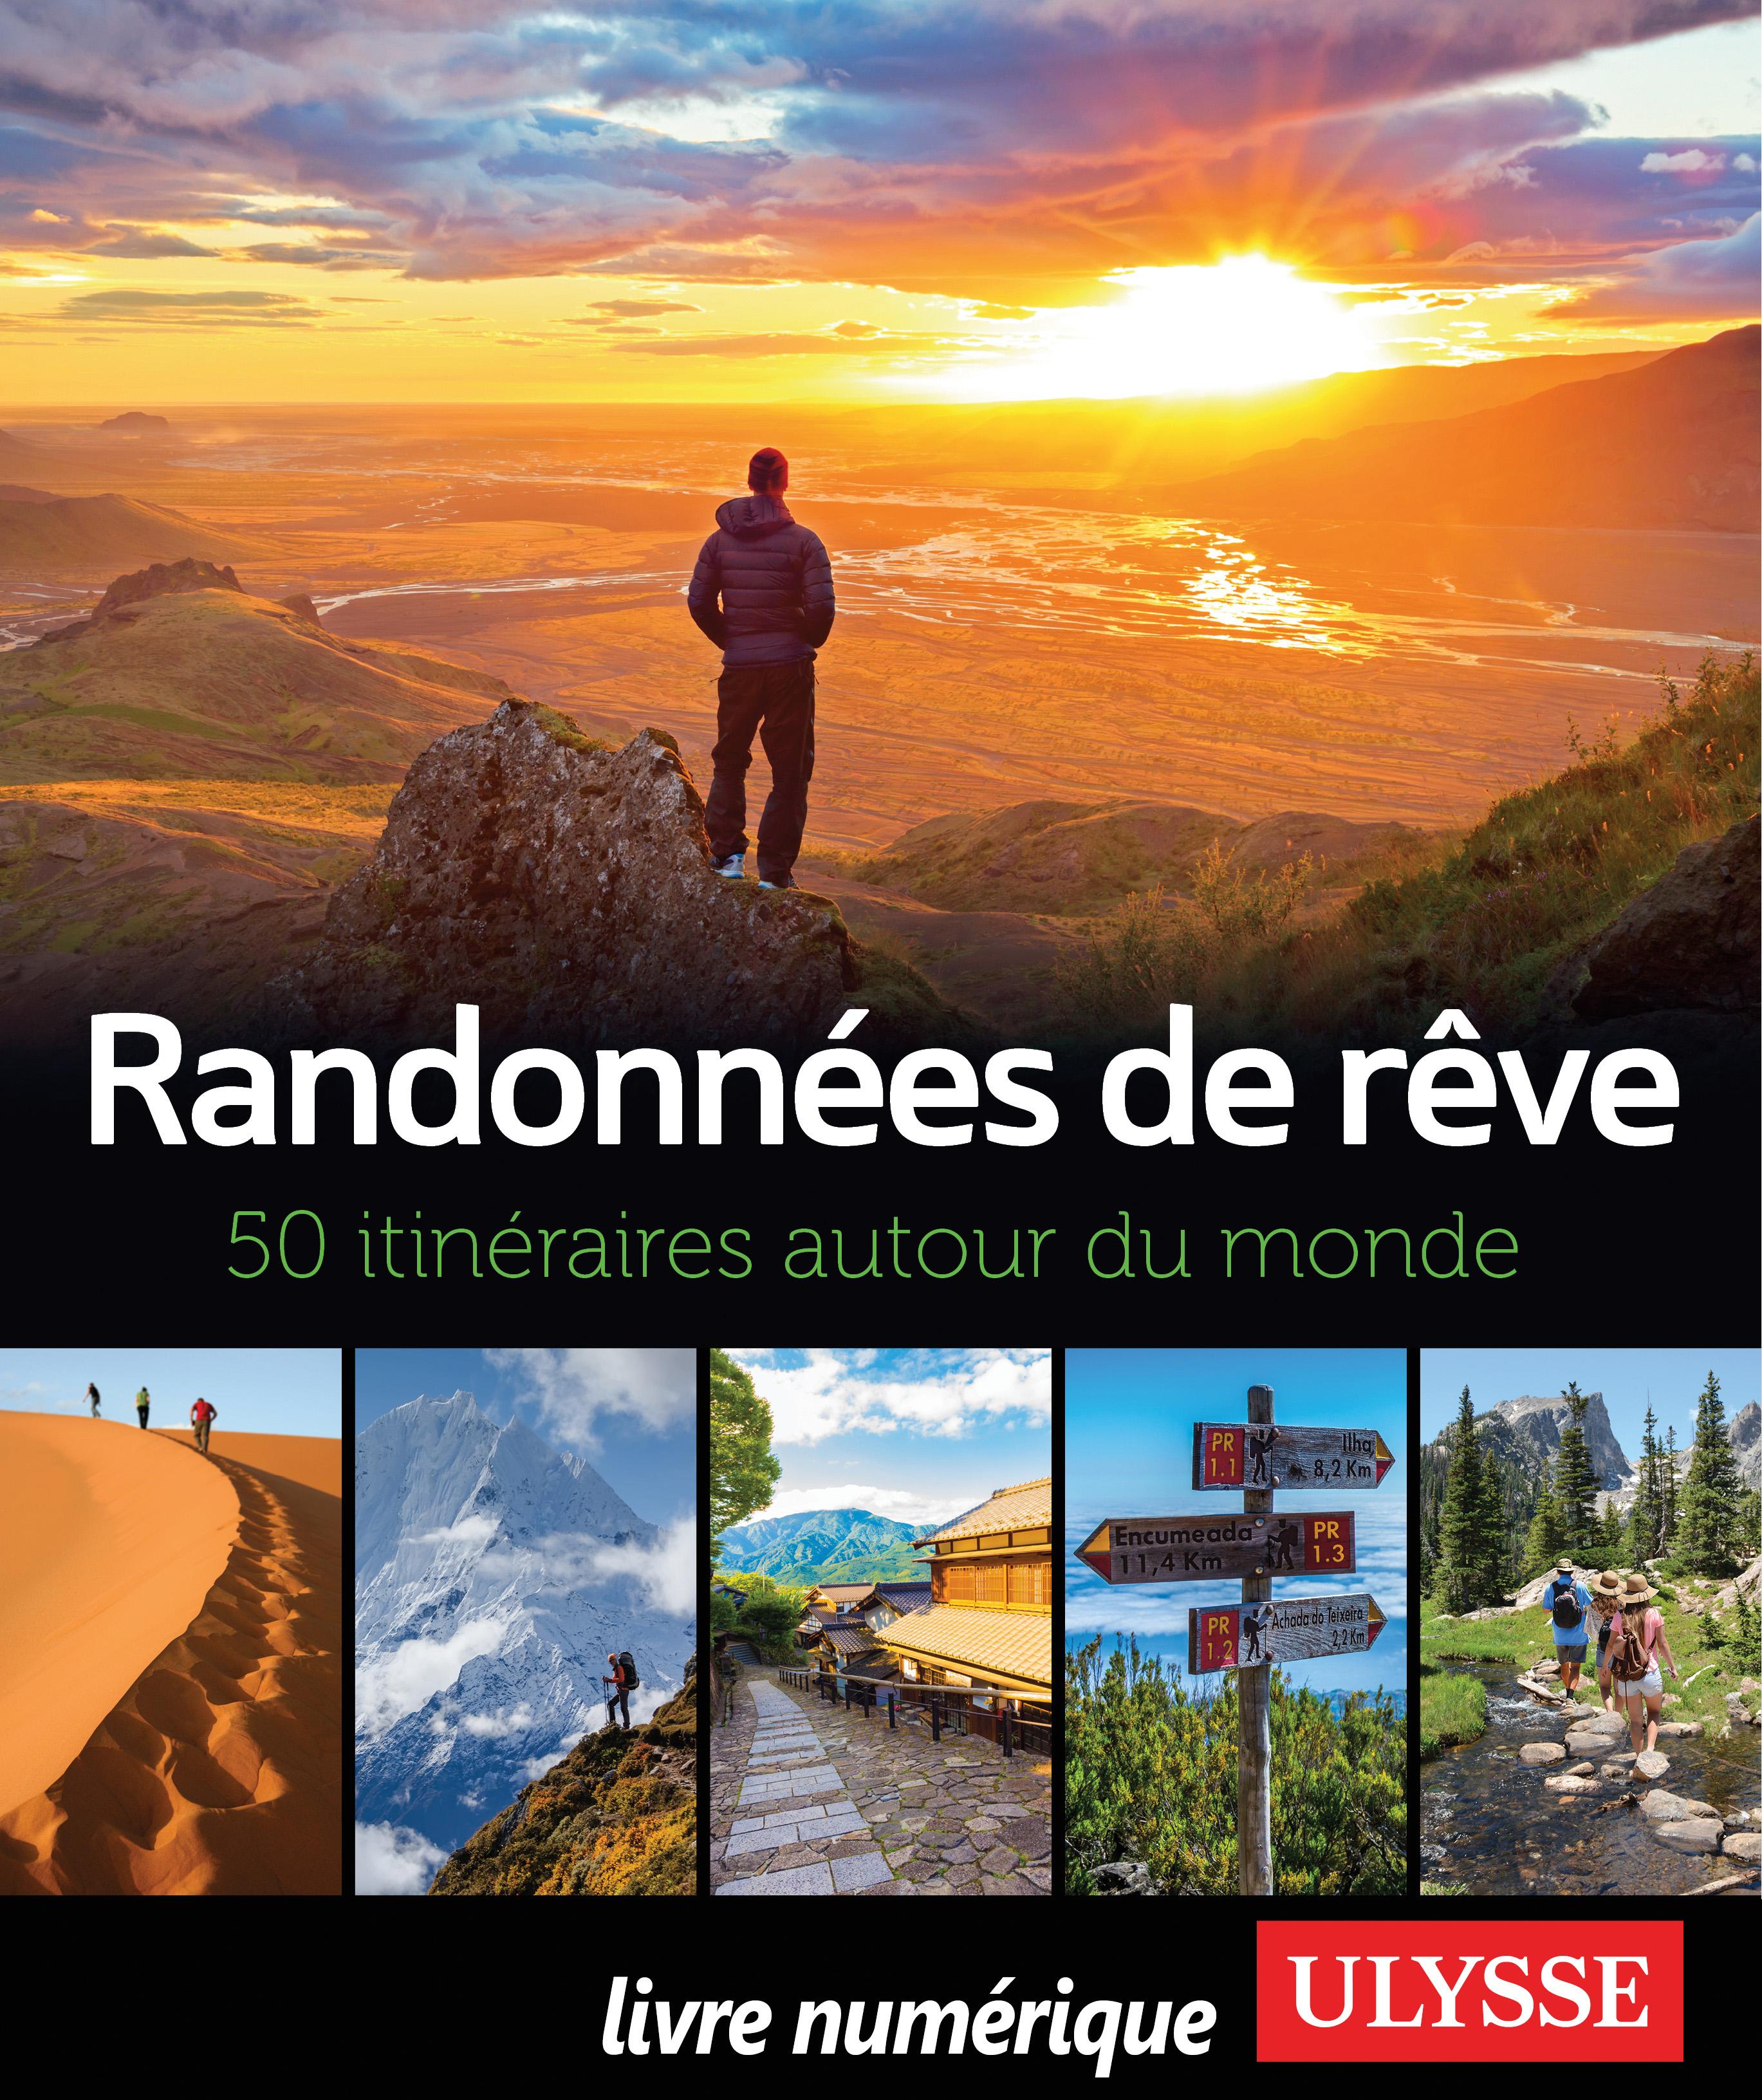 Randonnées de rêve - 50 iti...